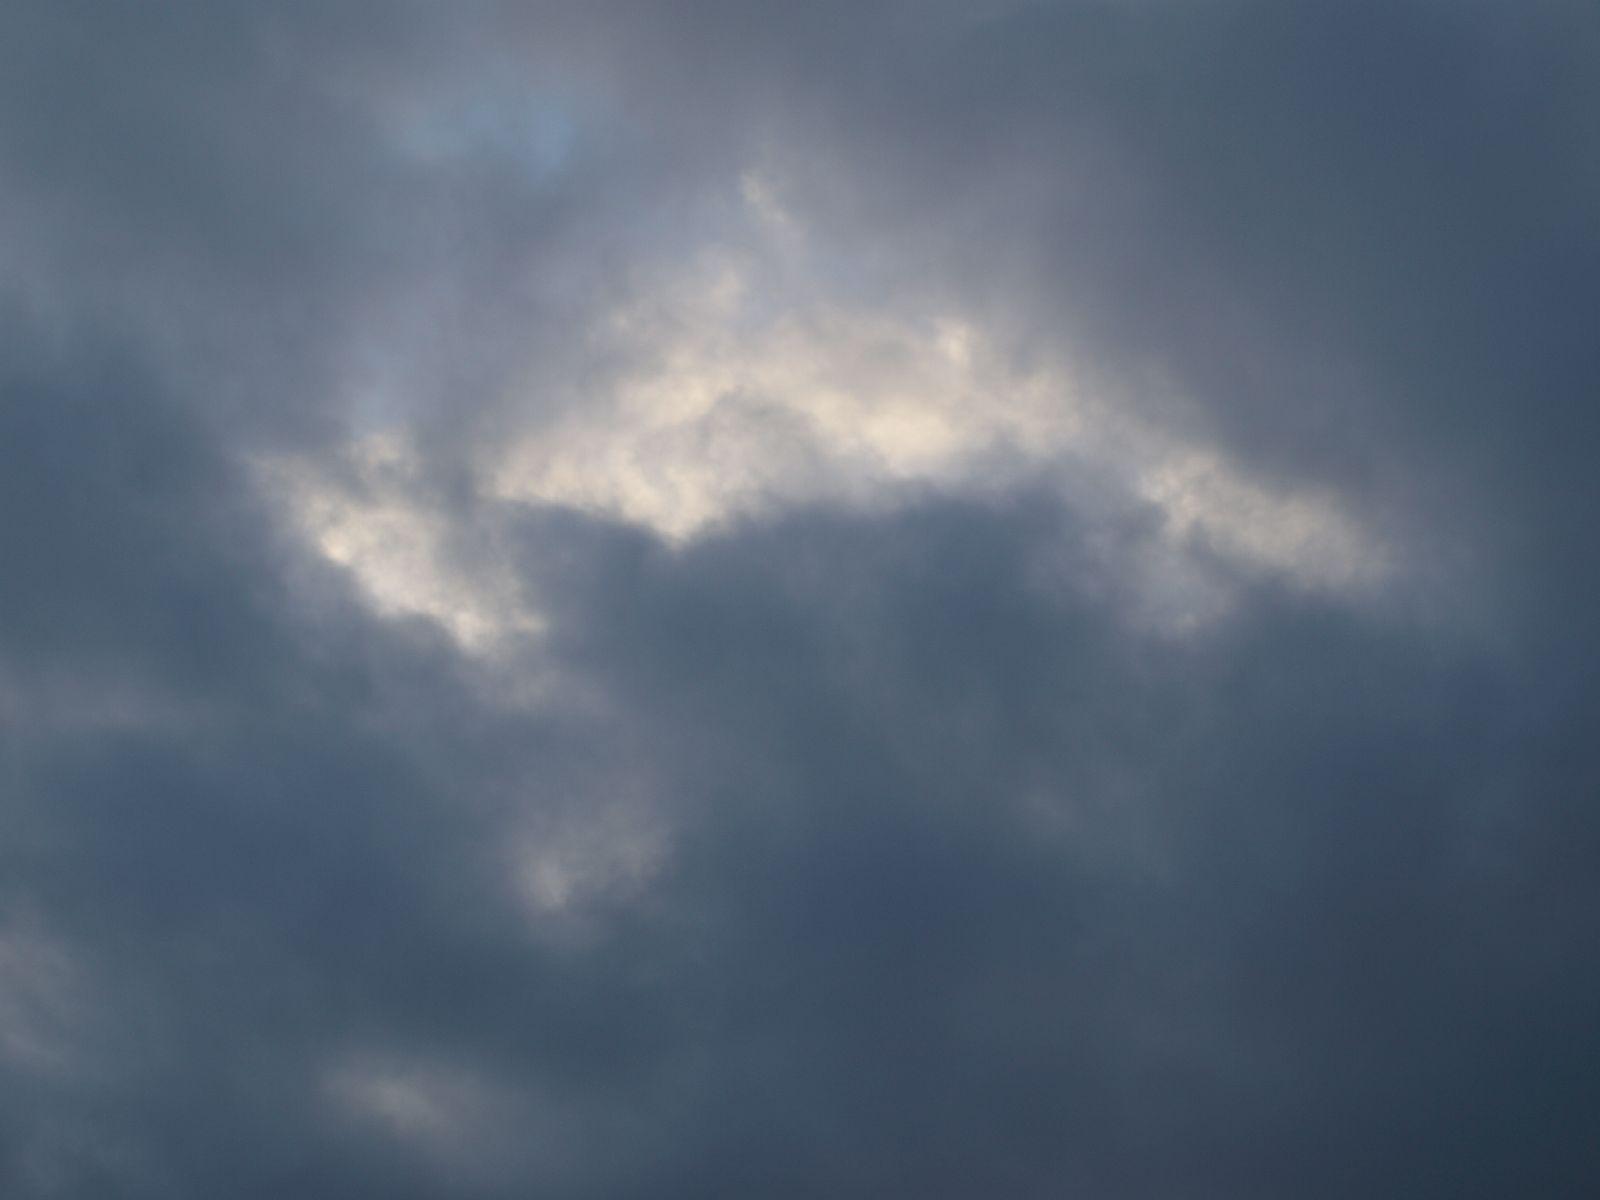 Himmel-Wolken-Foto_Textur_A_PA110190